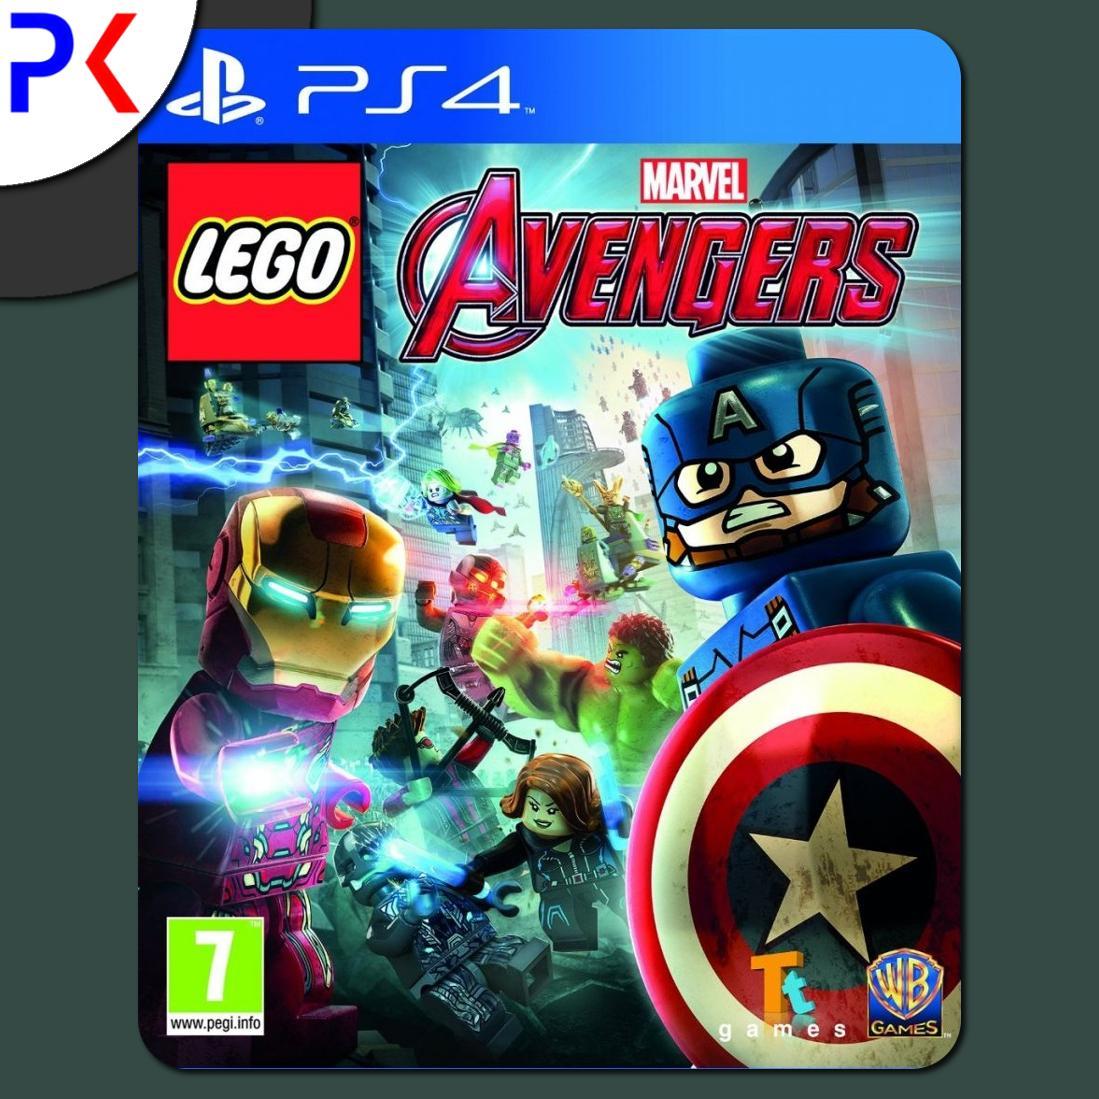 PS4 LEGO Marvels Avengers (R1)